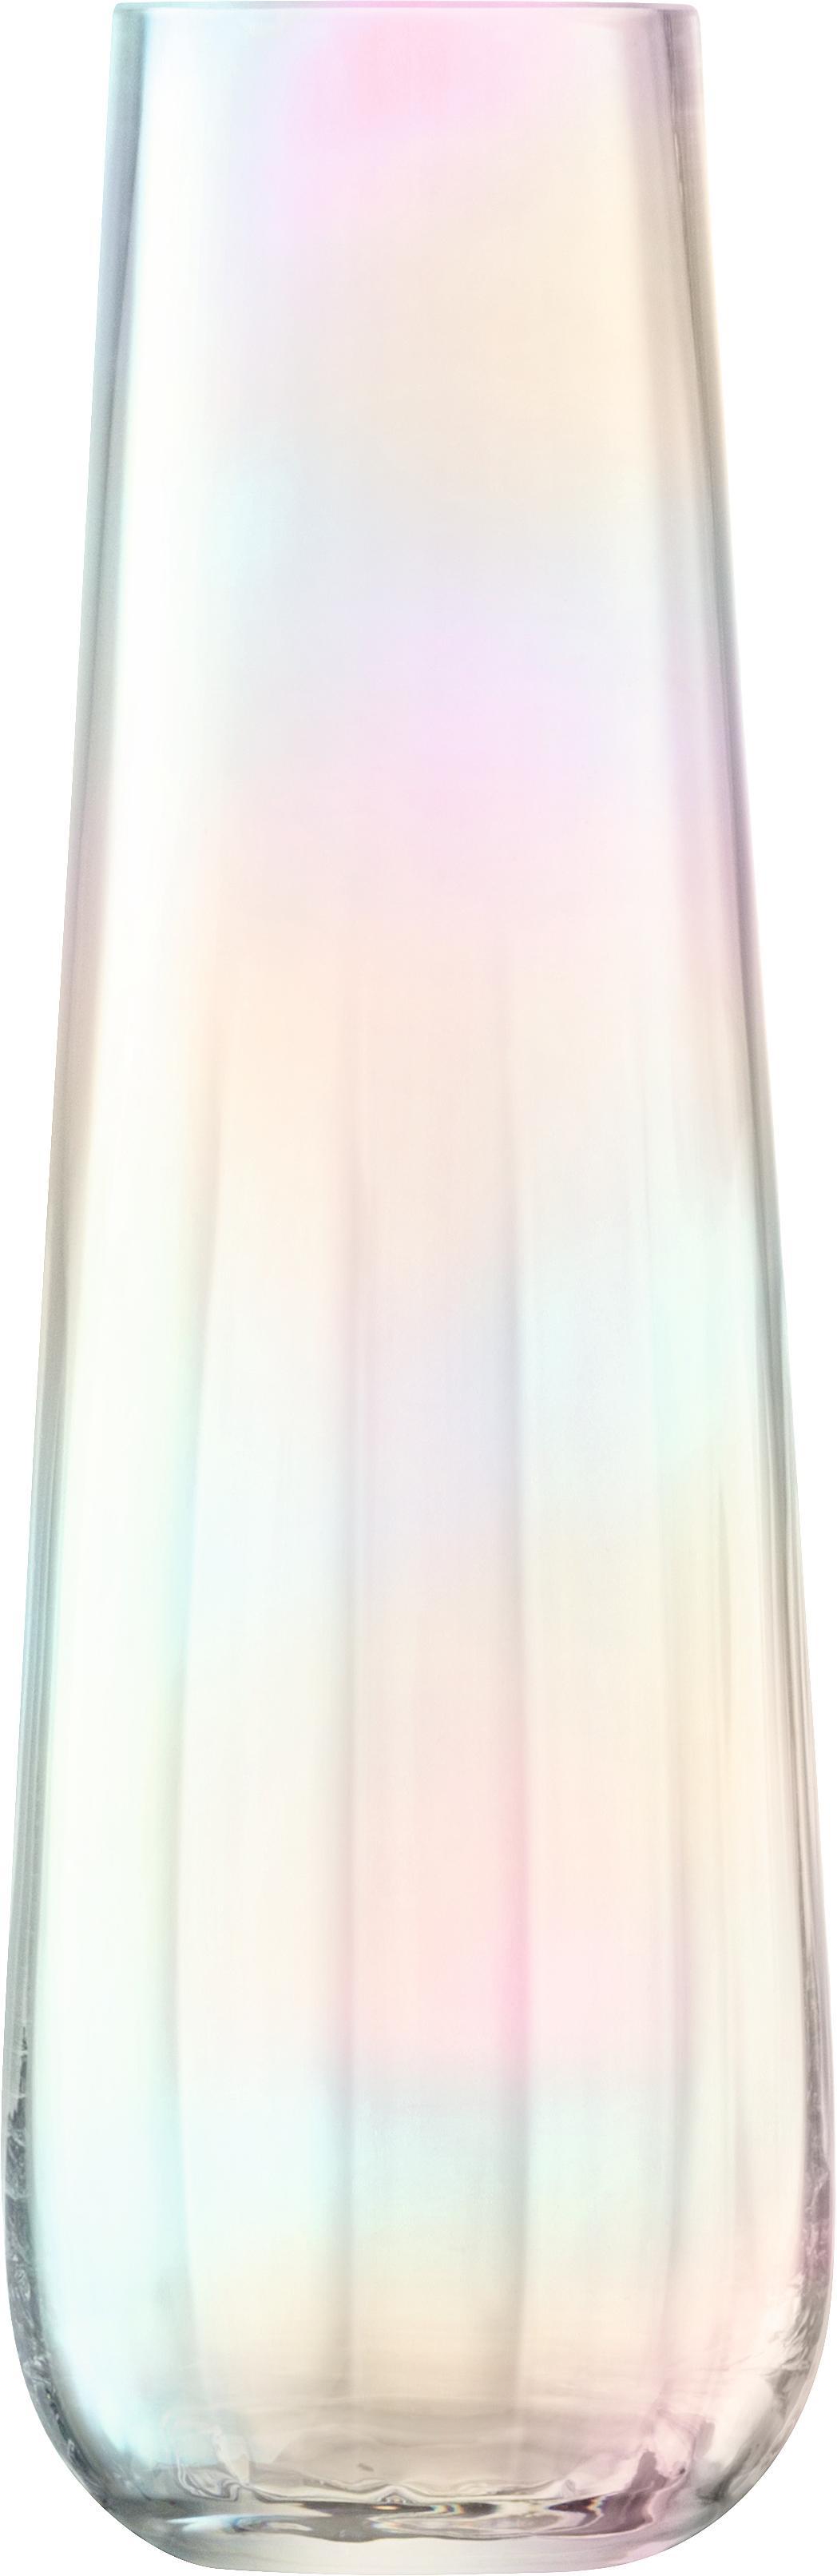 Vaso in vetro soffiato Pearl, Vetro, Riflessi madreperlacei, Ø 13 x Alt. 36 cm